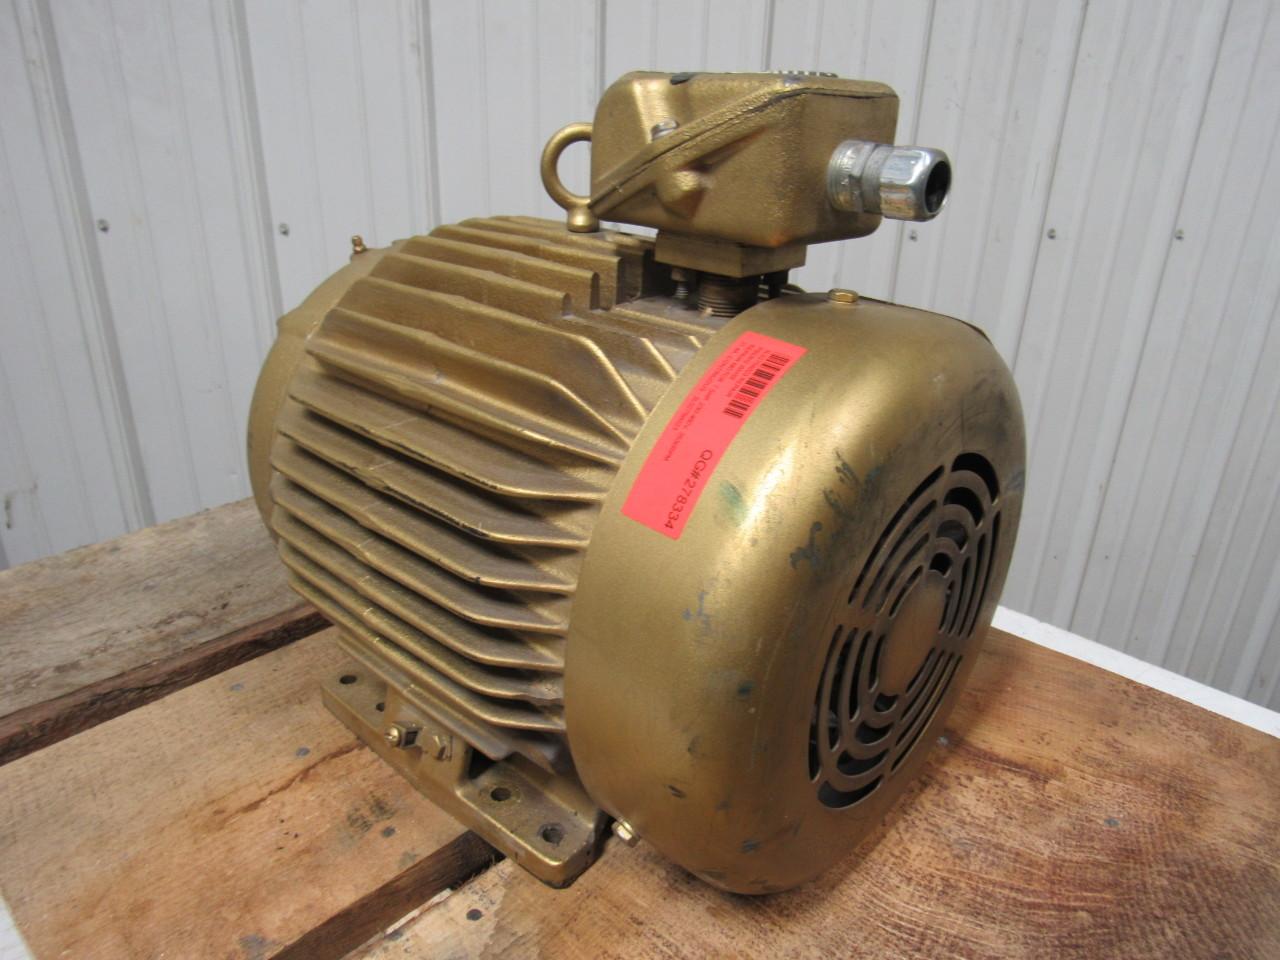 Baldor 07h997w280e7 7 5hp 3525rpm 230 460v 286tz frame for Baldor electric motors for sale